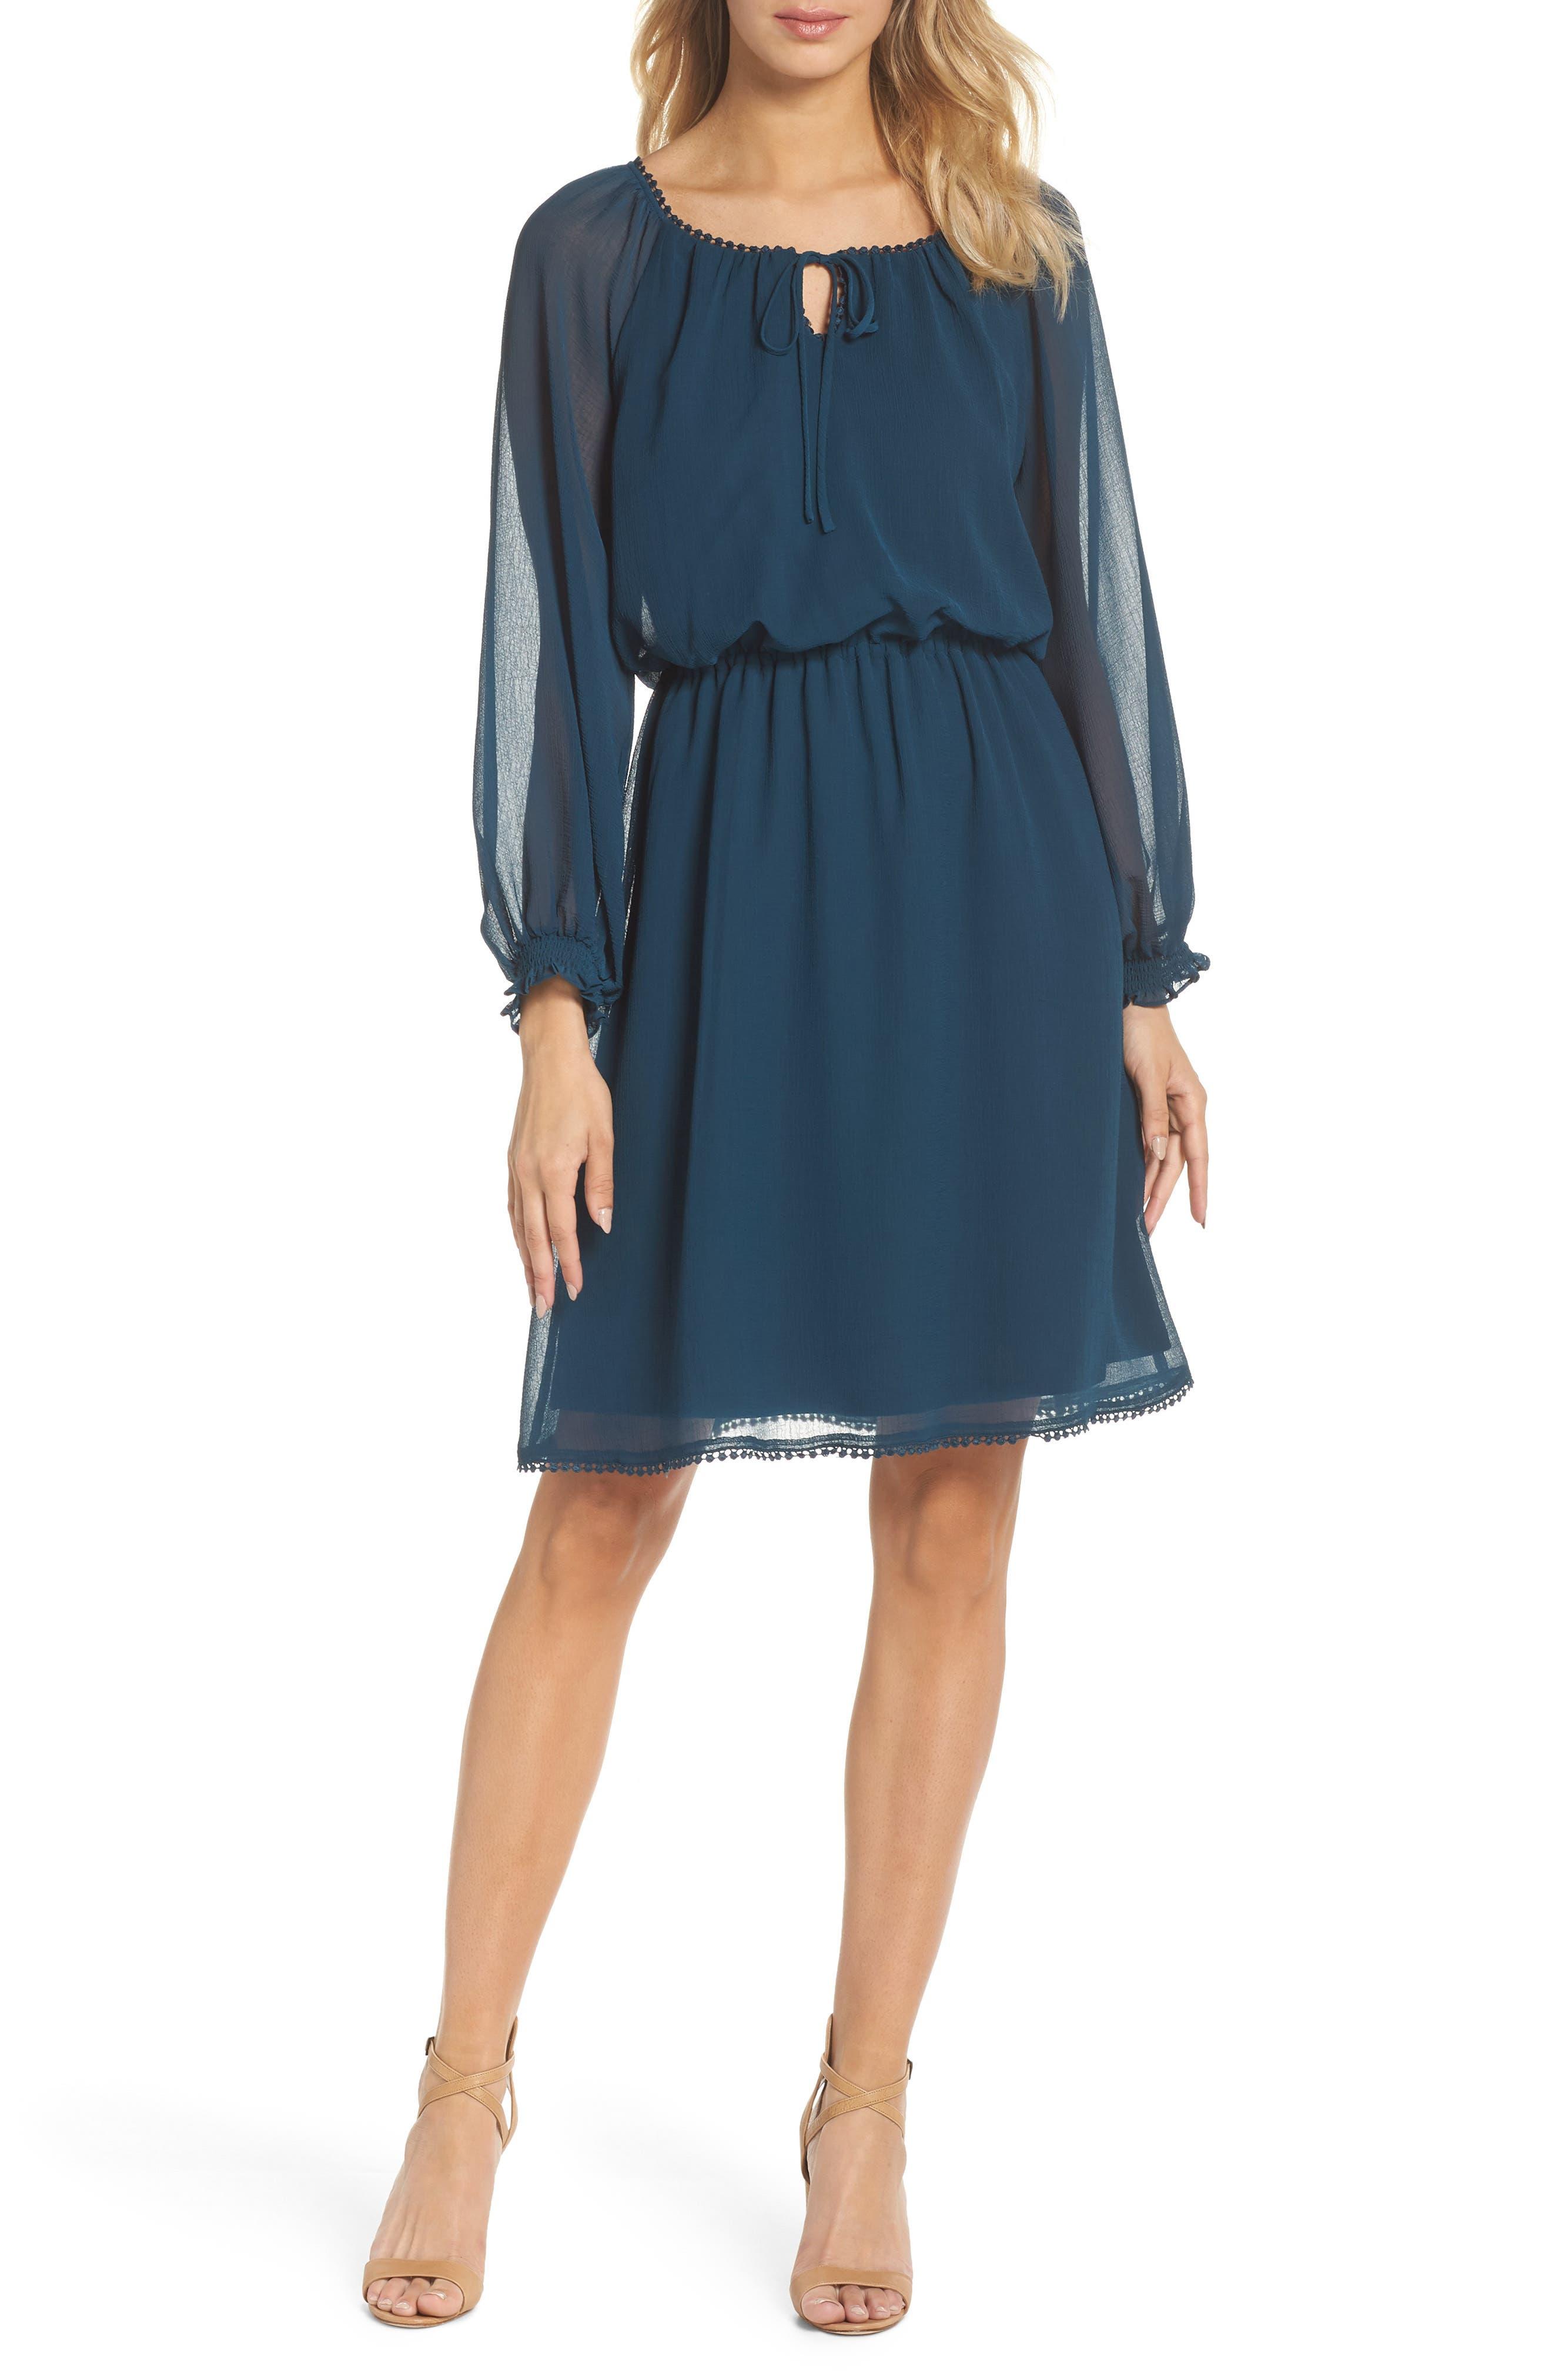 Adrianna Papell Bishop Sleeve Blouson Dress